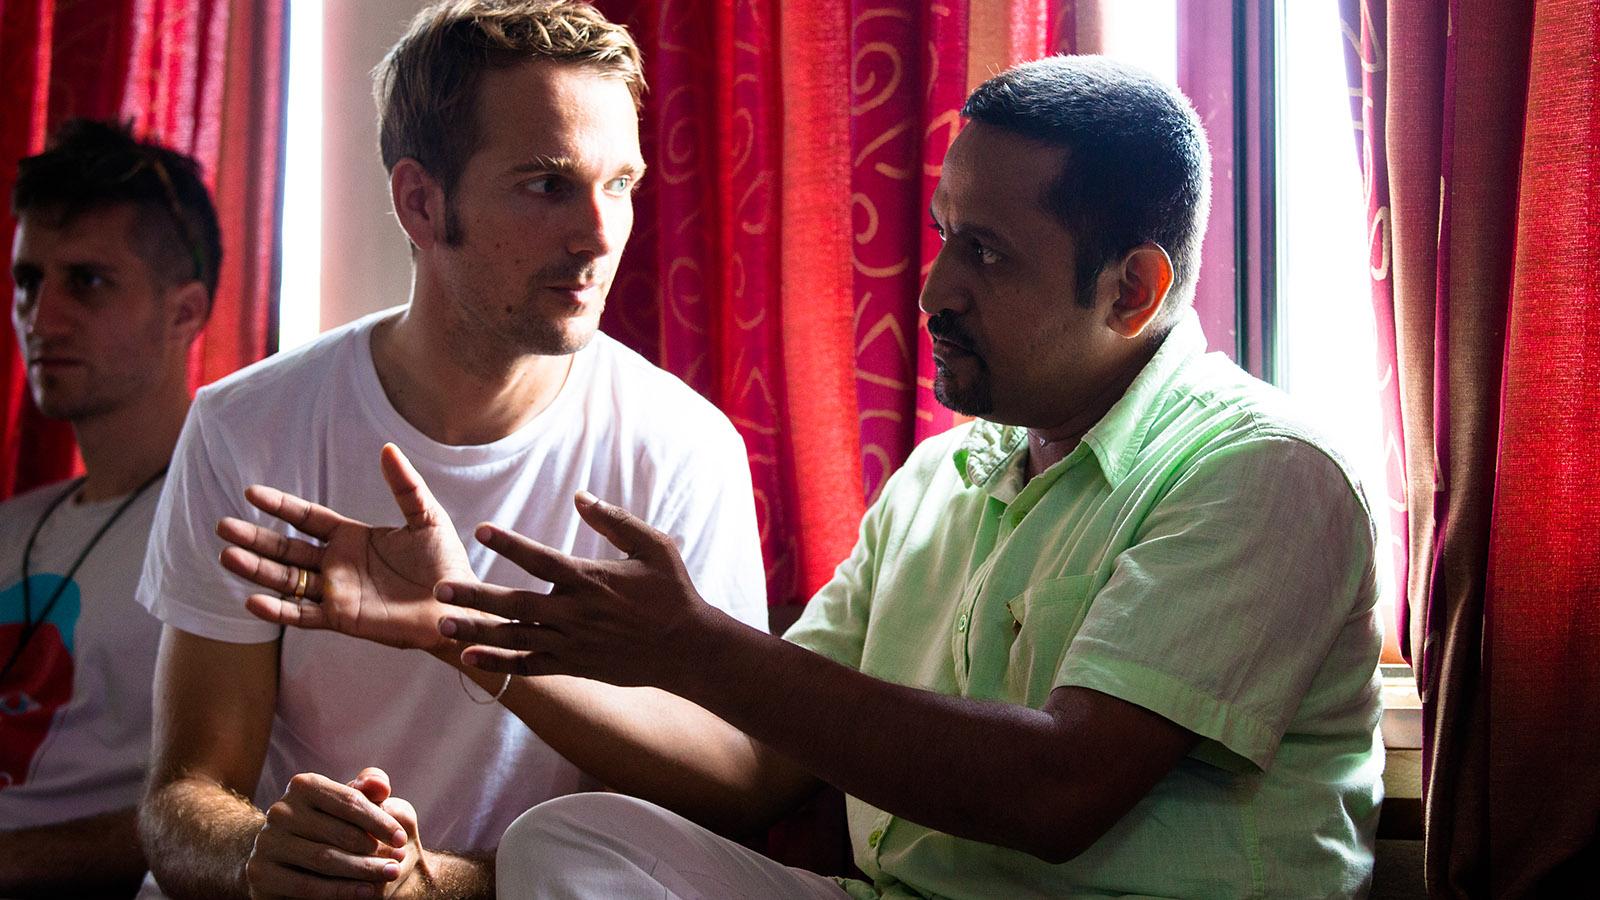 Projekt_Sri Lanka_Peace_Slider_06